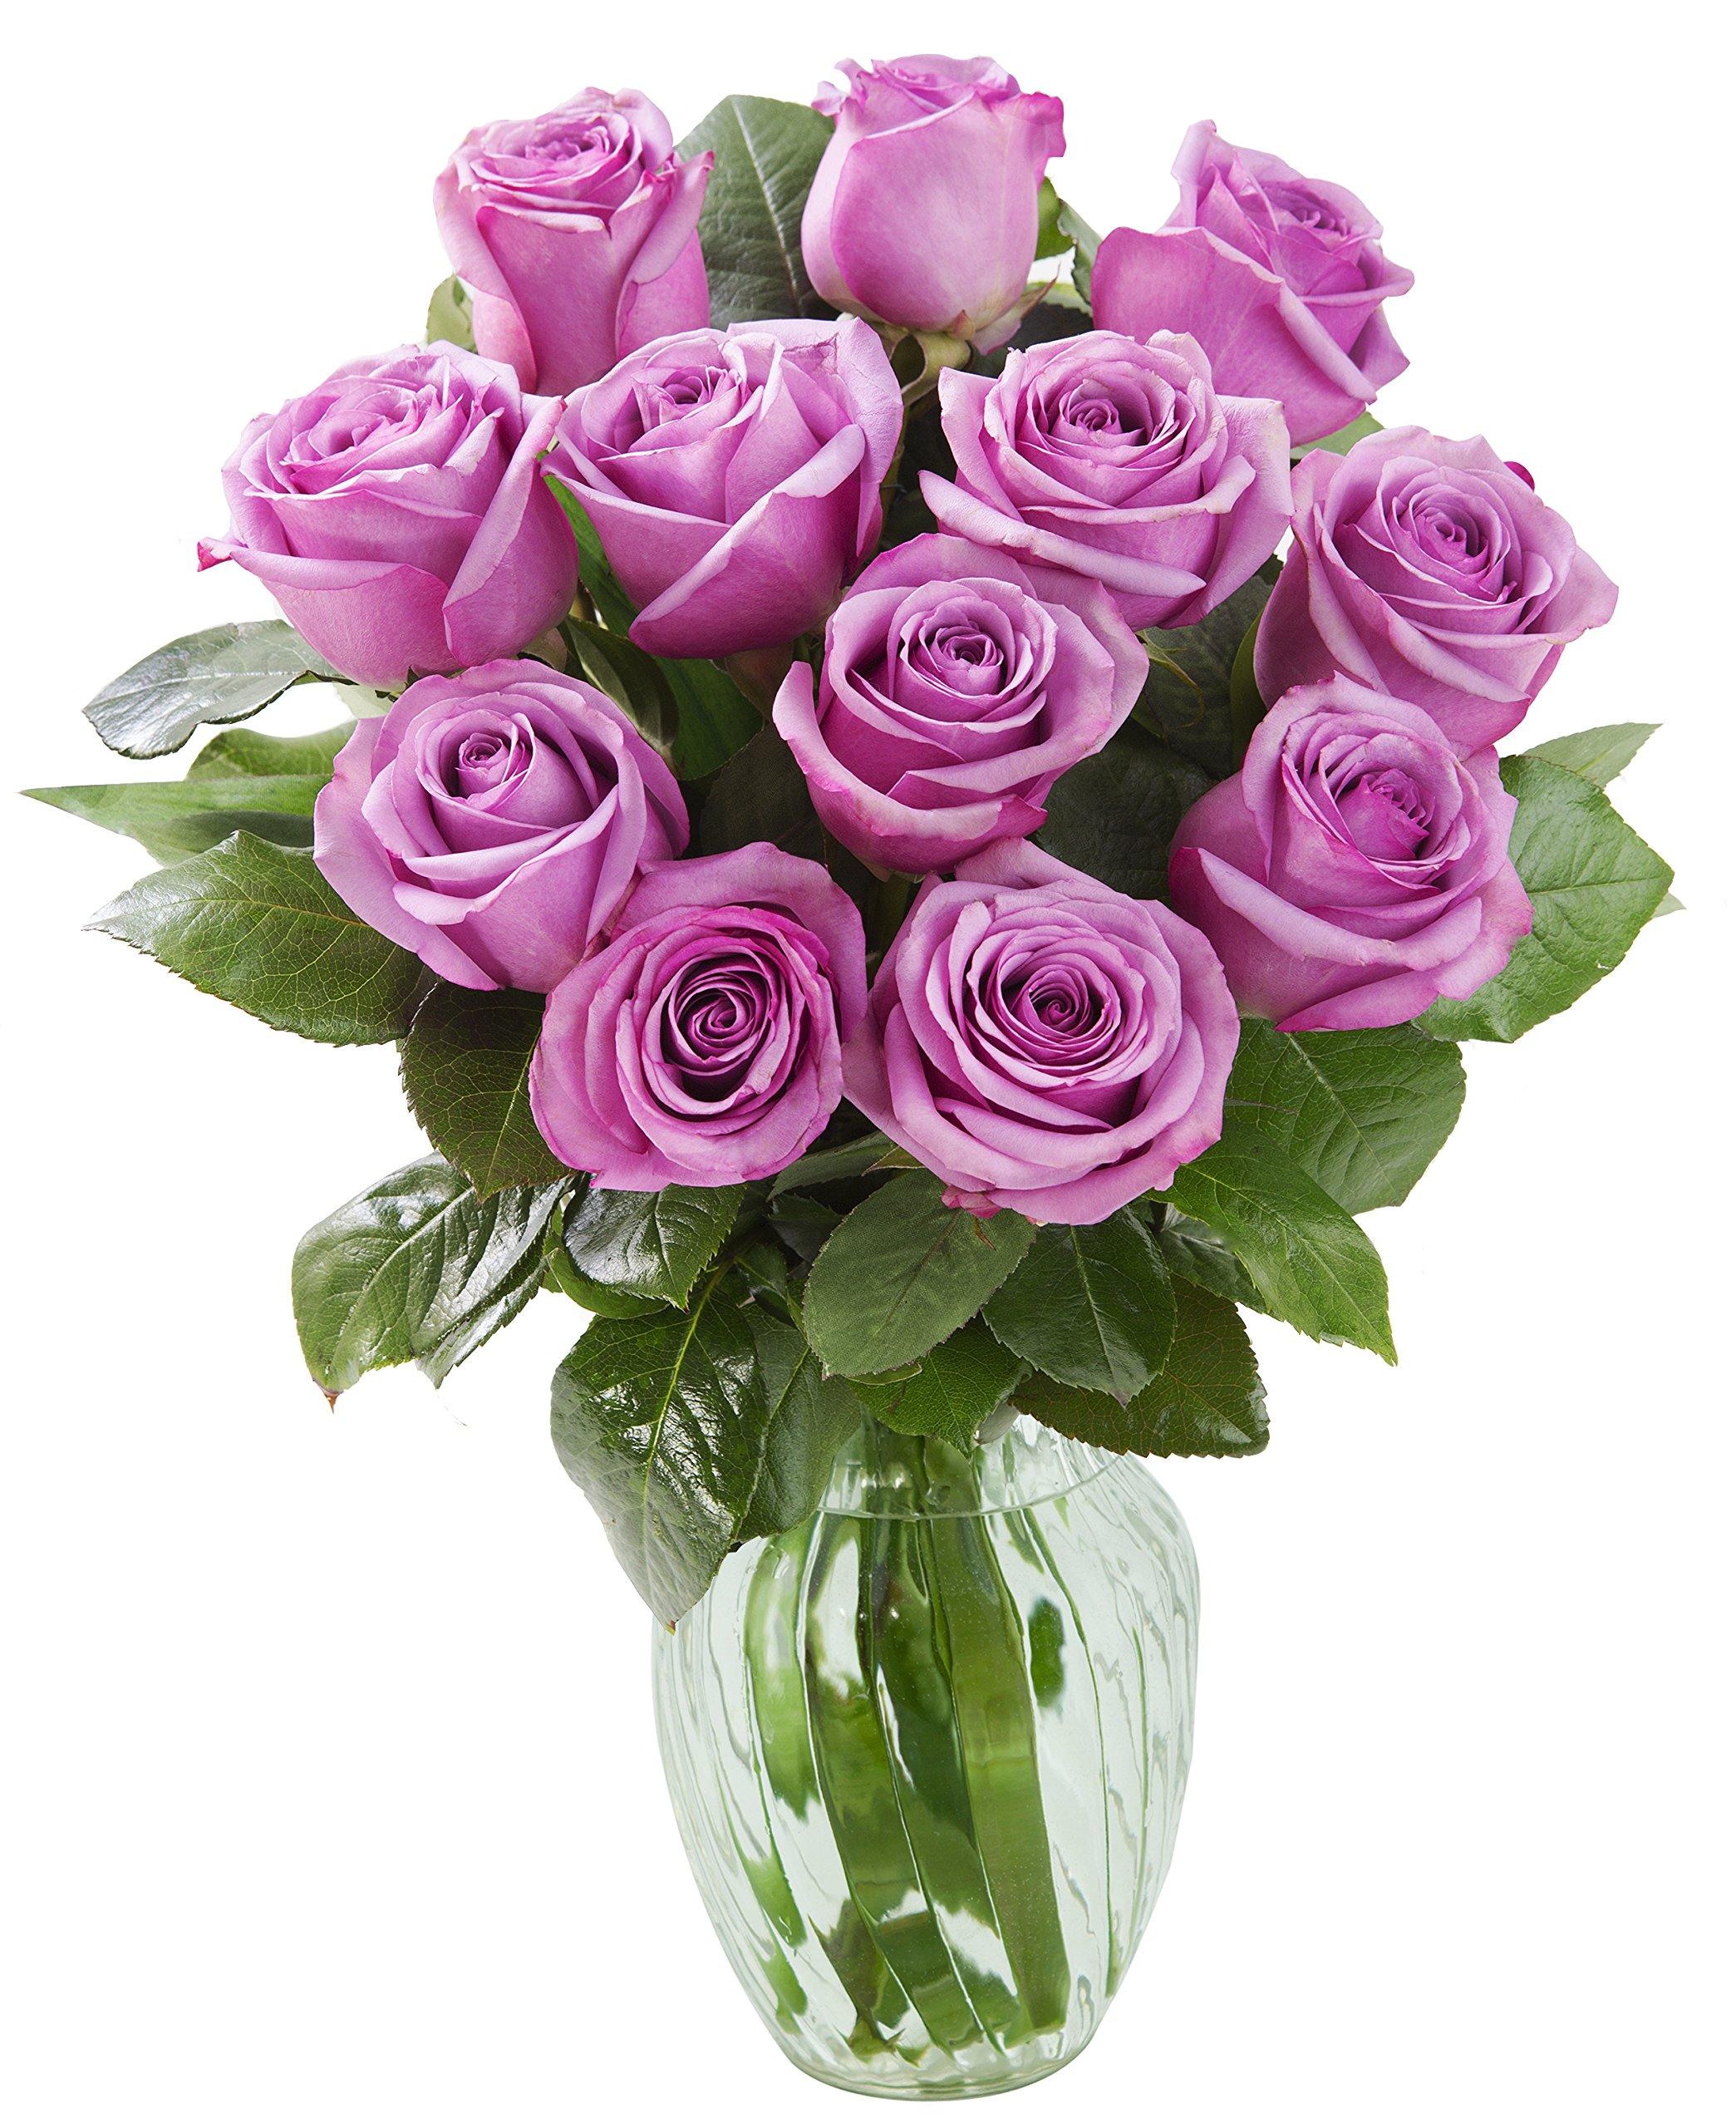 KaBloom Bouquet of 12 Fresh Purple Roses (Farm-Fresh, Long-Stem) with Vase by KaBloom